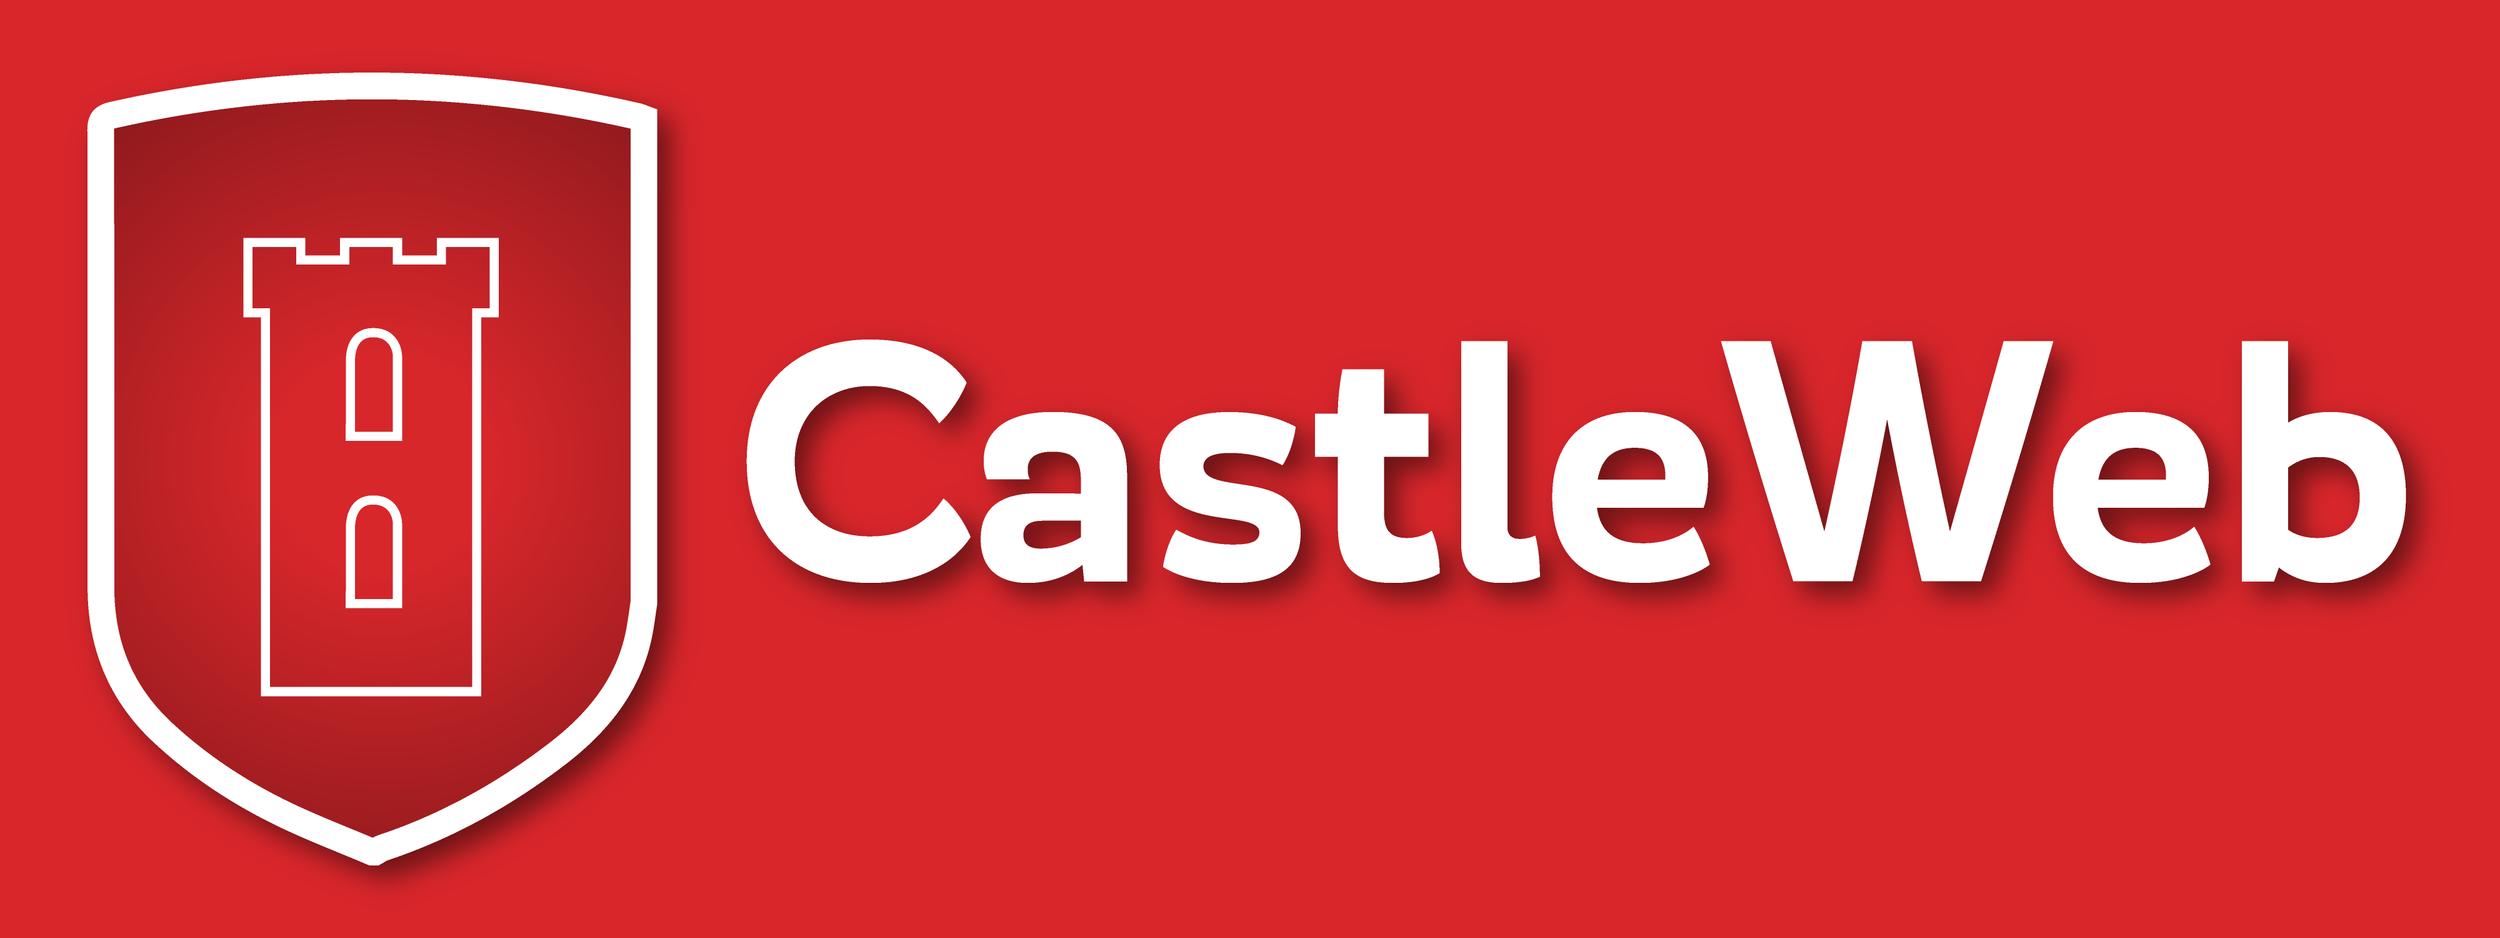 CastleWeb_logo_red-01-01.png